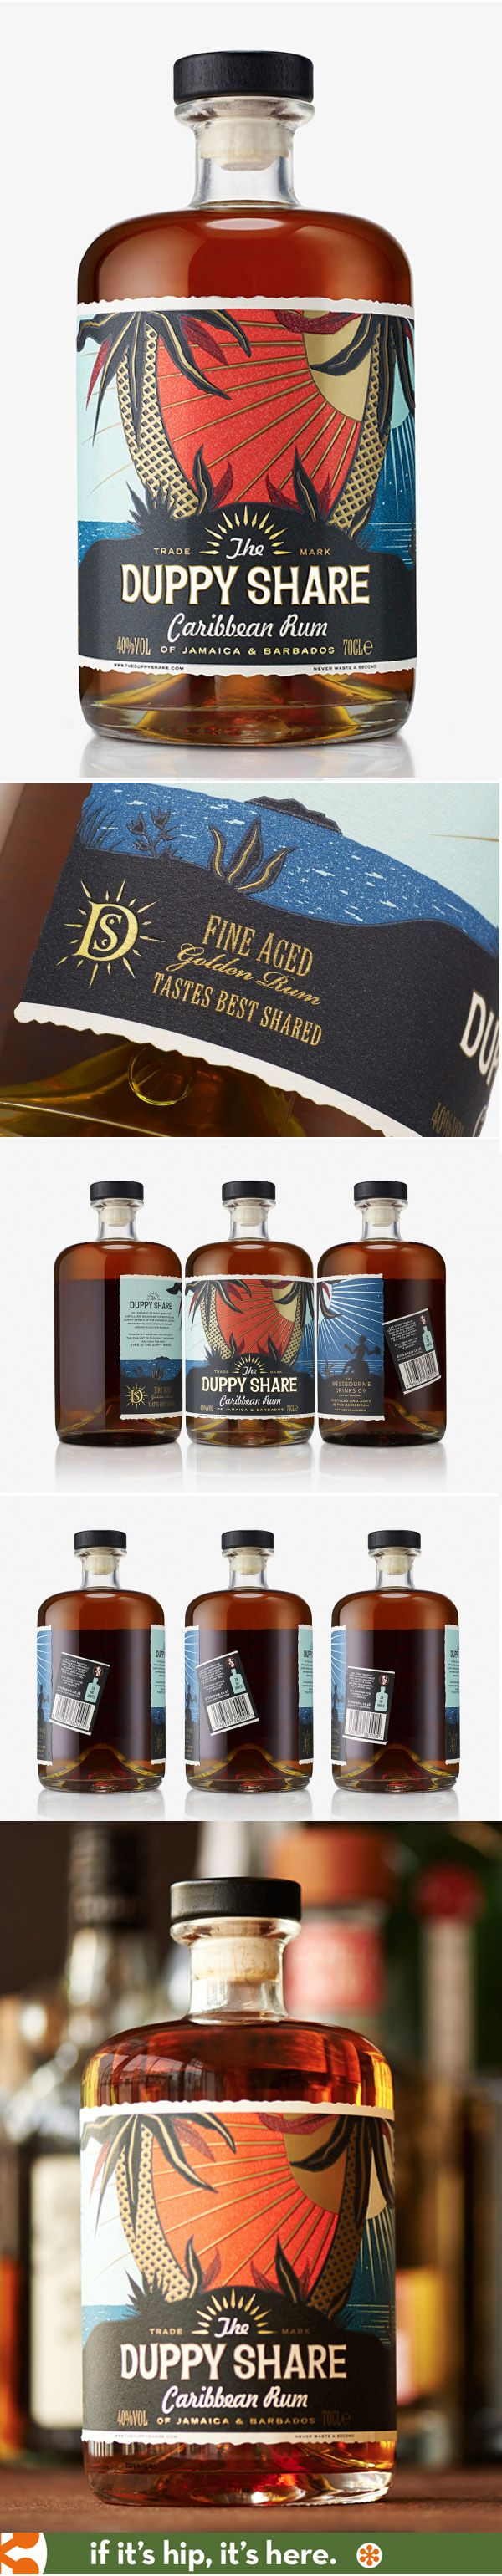 Duppy Share Carribean Rum label design by B&B Studio.